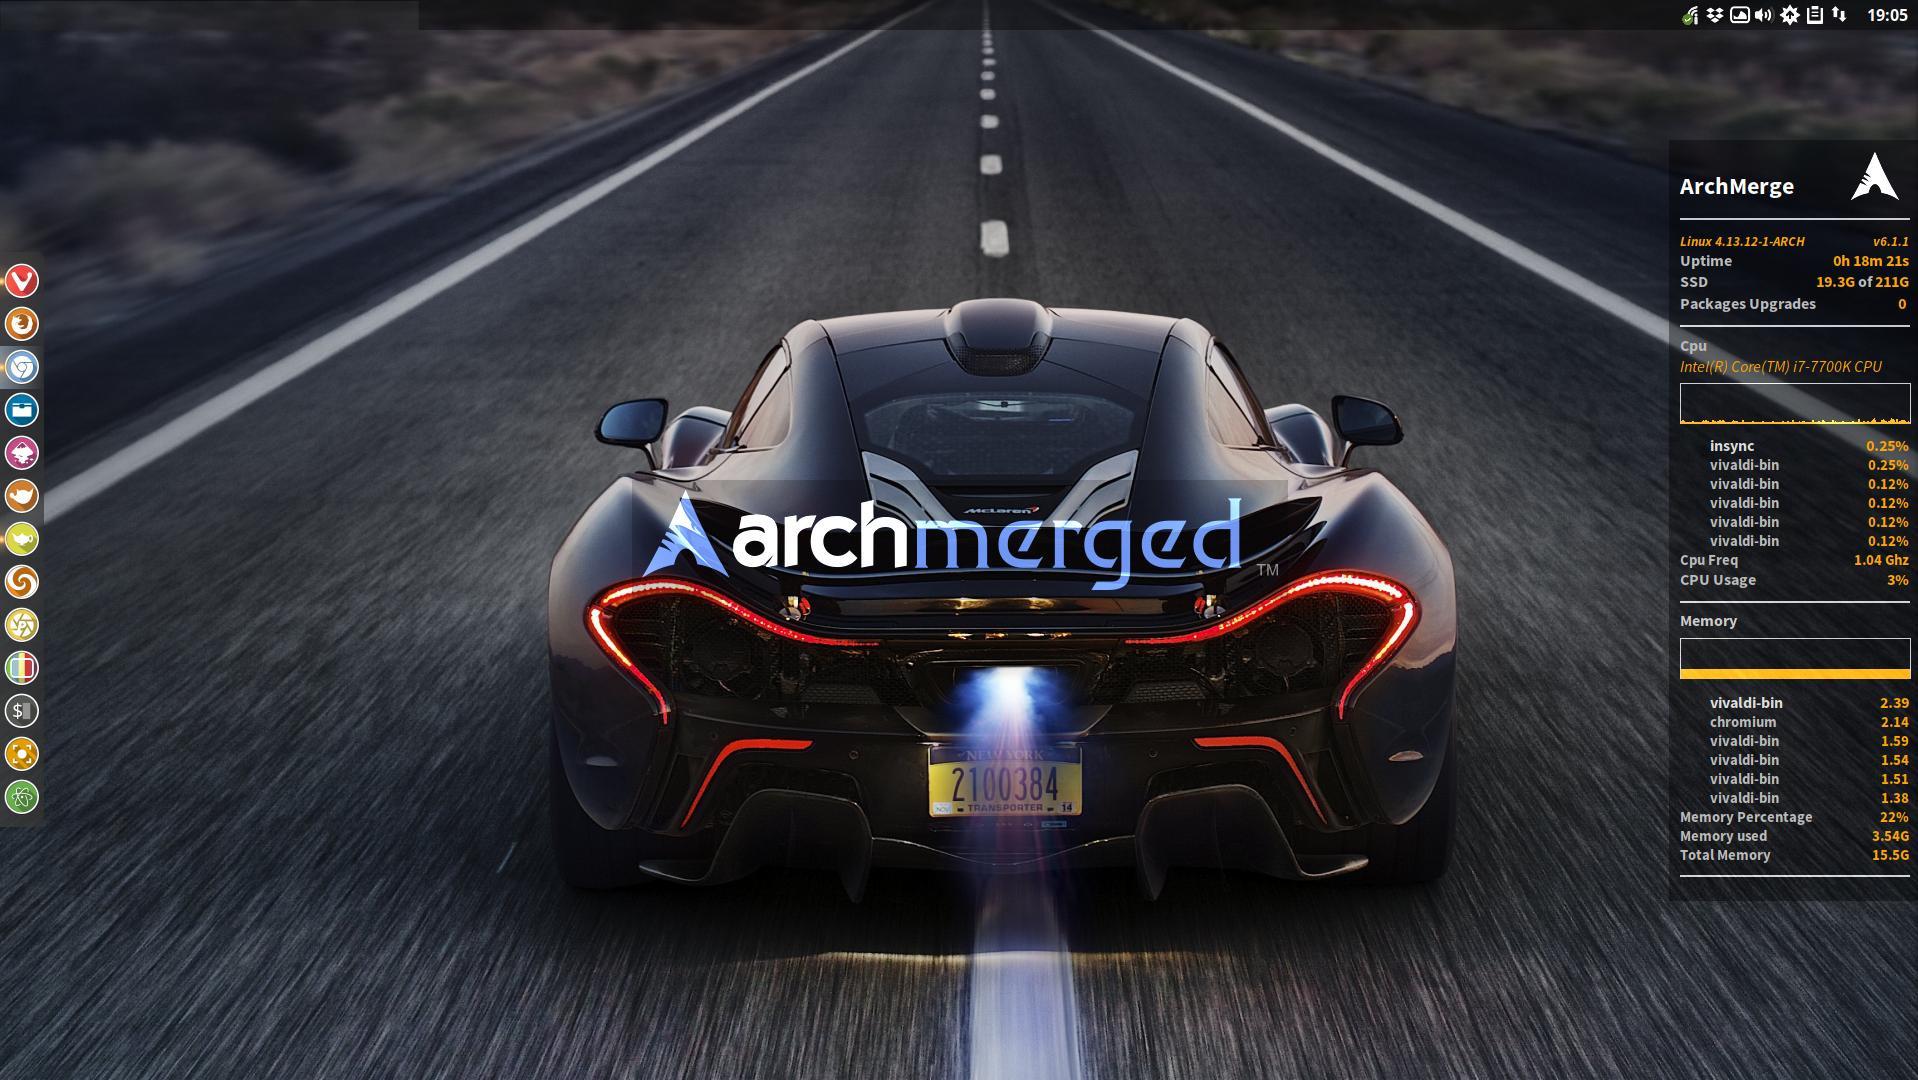 ArchMergeD Kirk Release 6.2